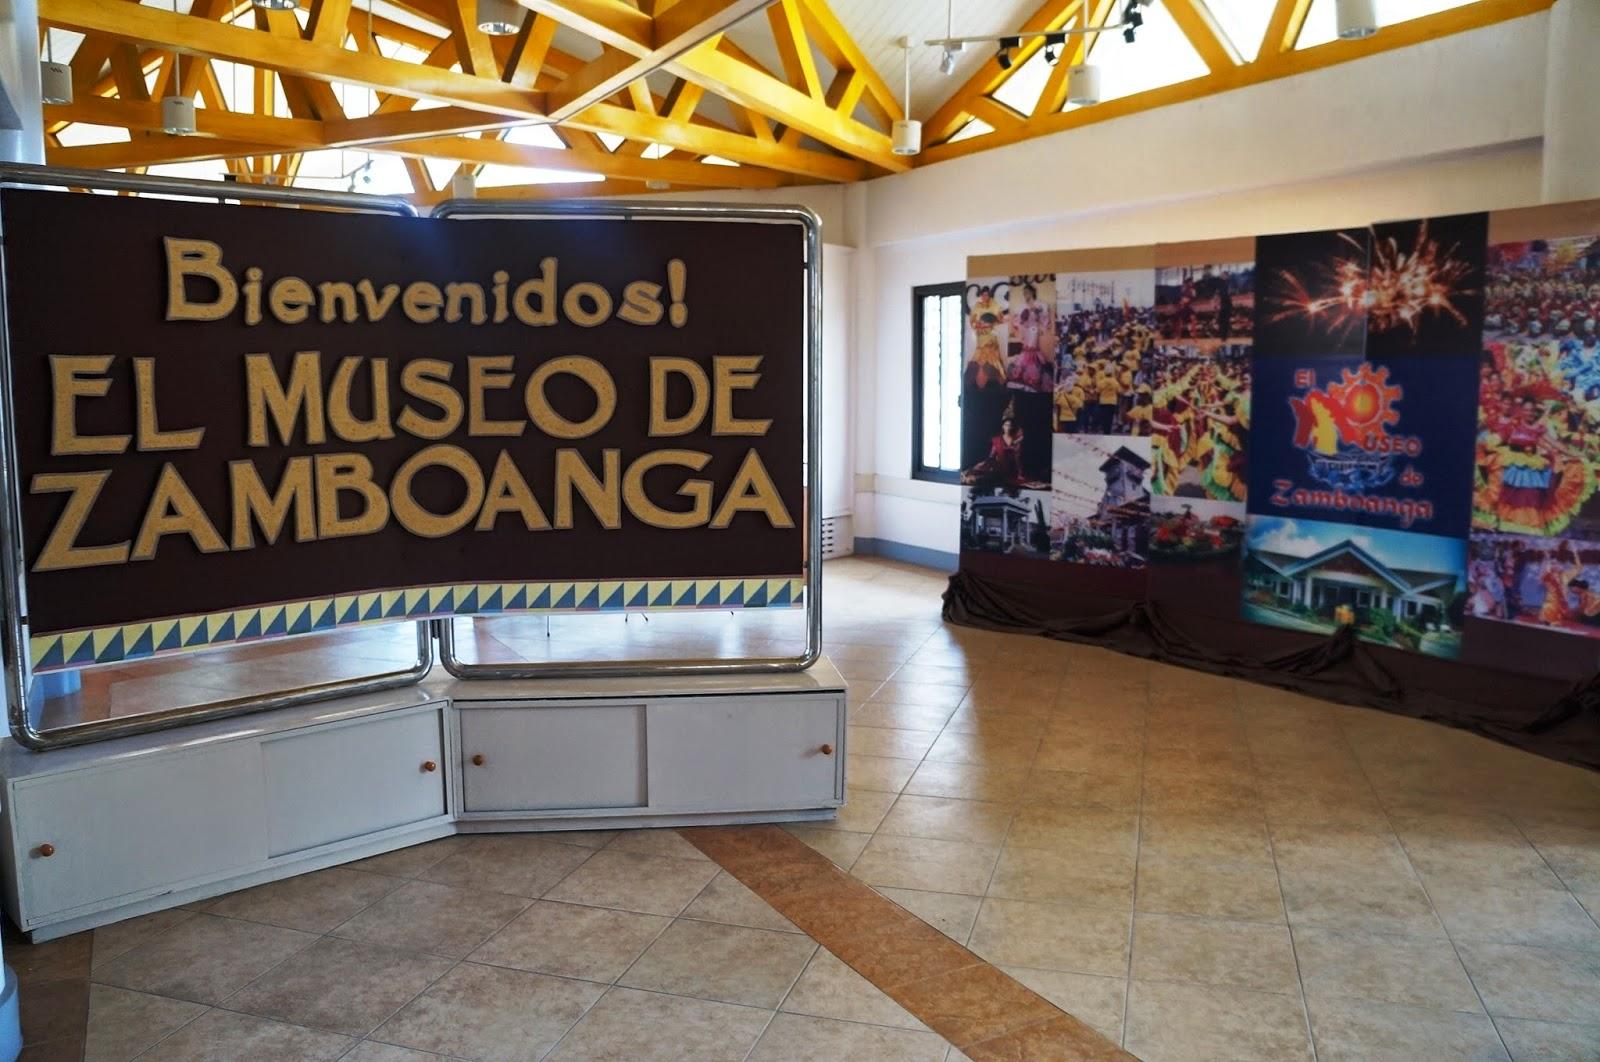 81 Interior Designer Zamboanga About Grand Astoria Hotel Zamboanga City Town Home J